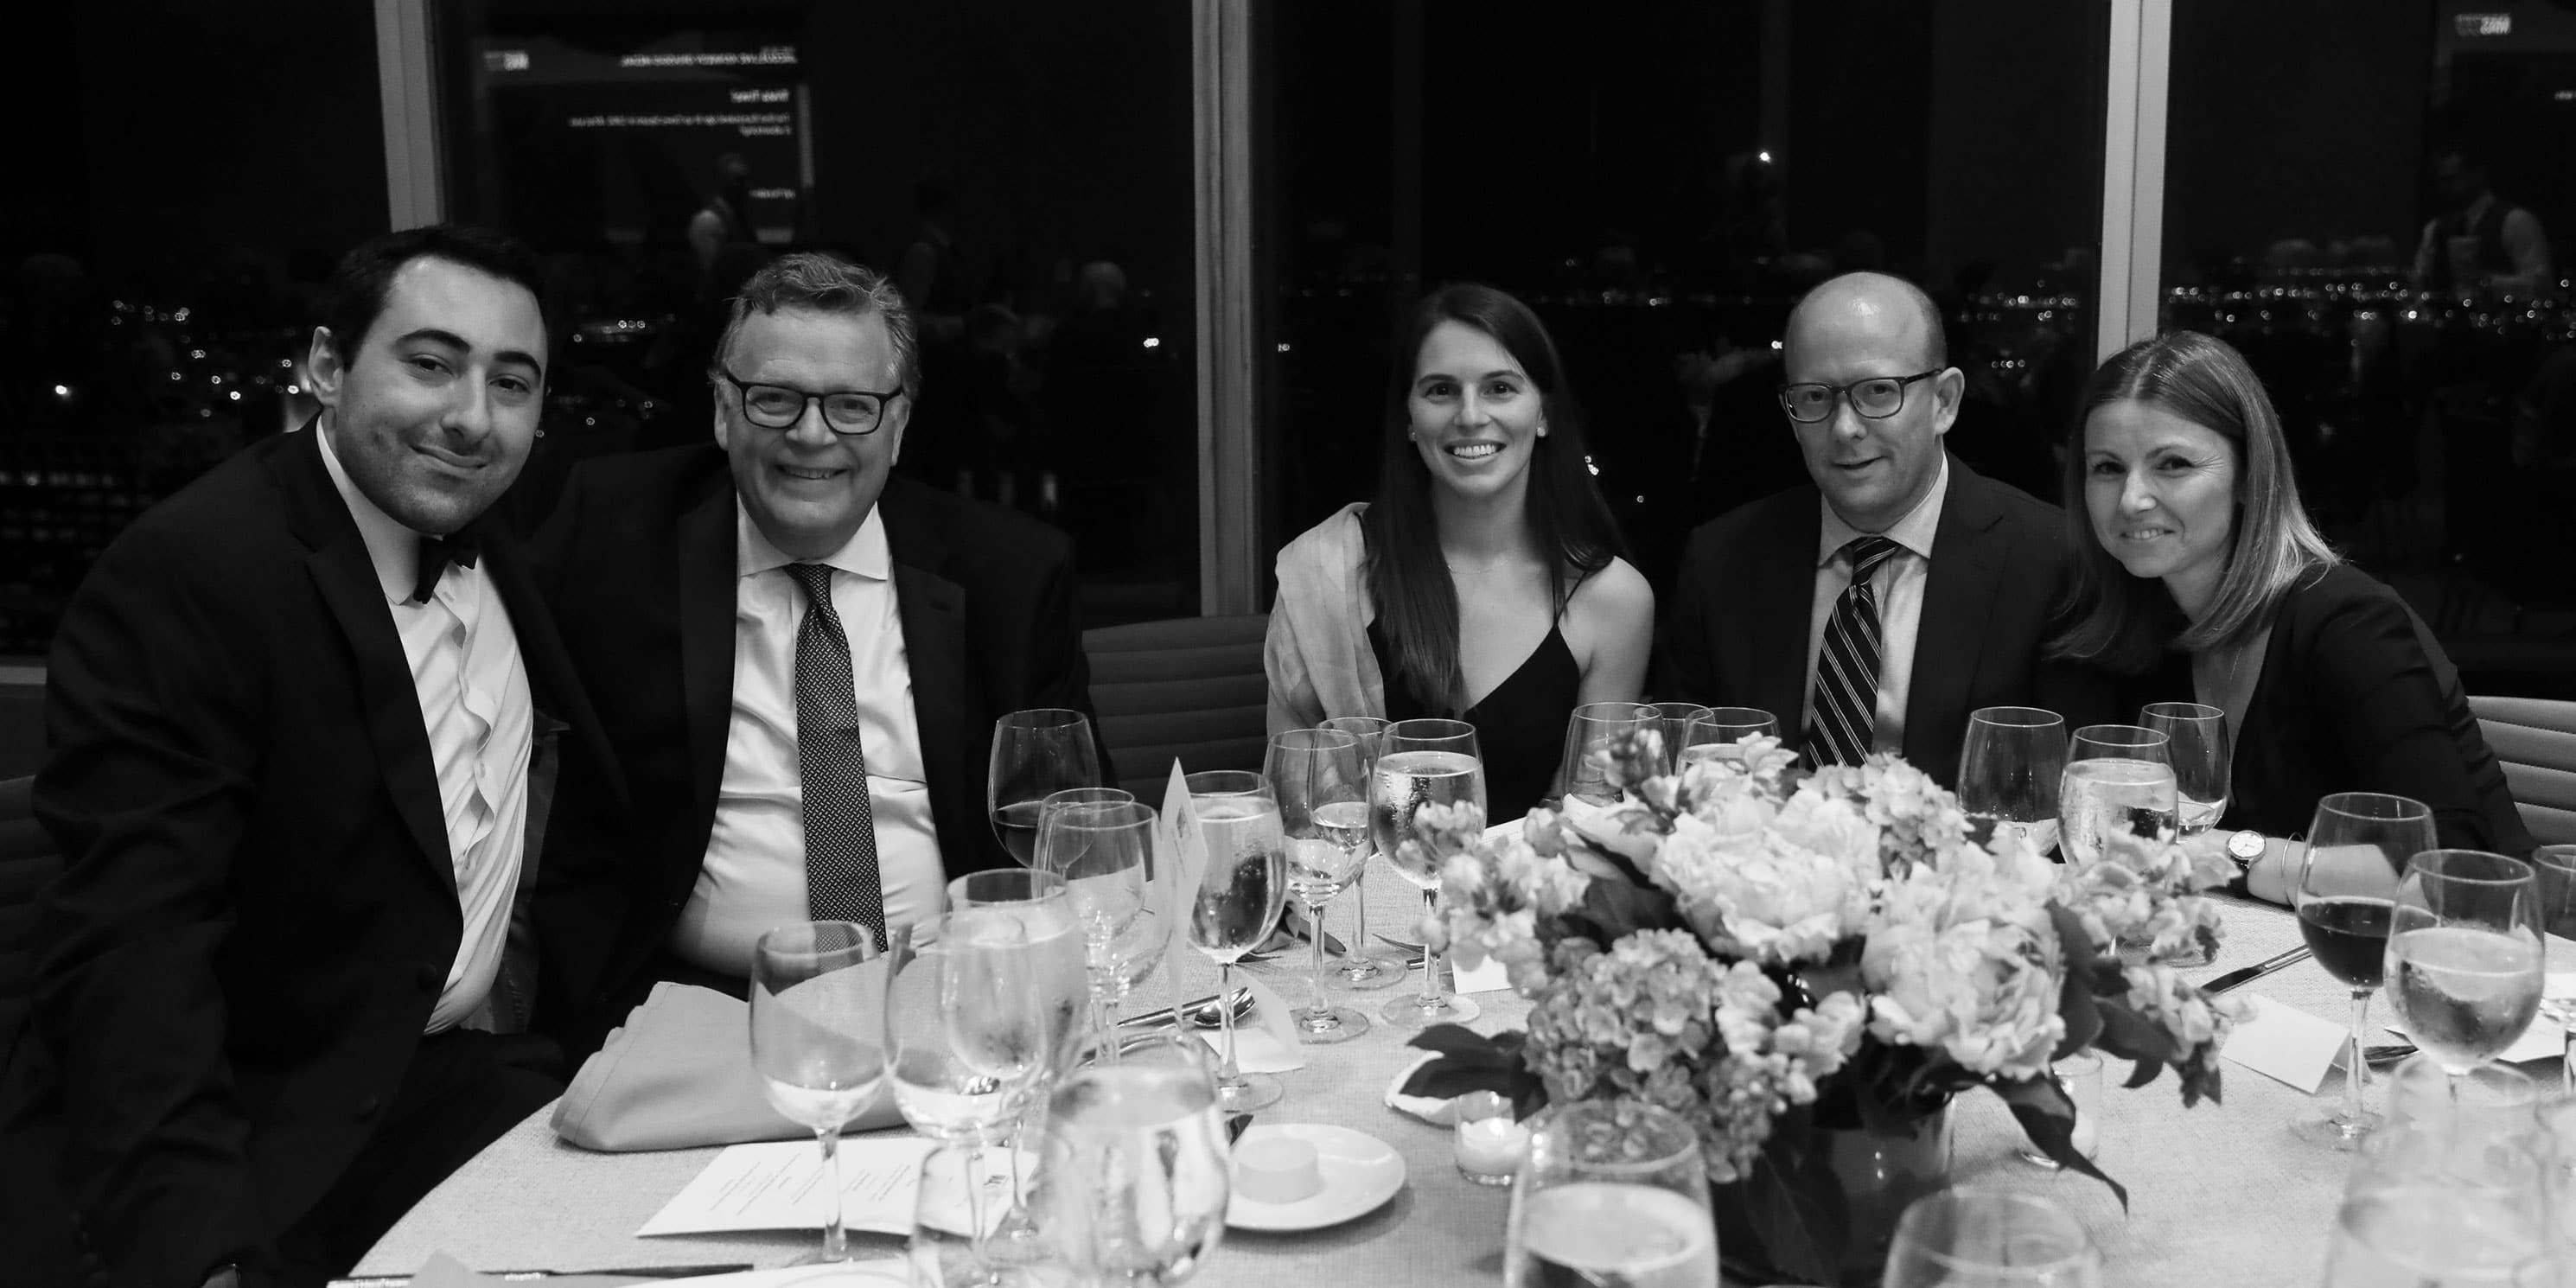 Pittas Eleftherios, Jack Klein, Caitlyn Dewitt, Chris McCartin, and Kimberly Garcia at the 2018 Gala